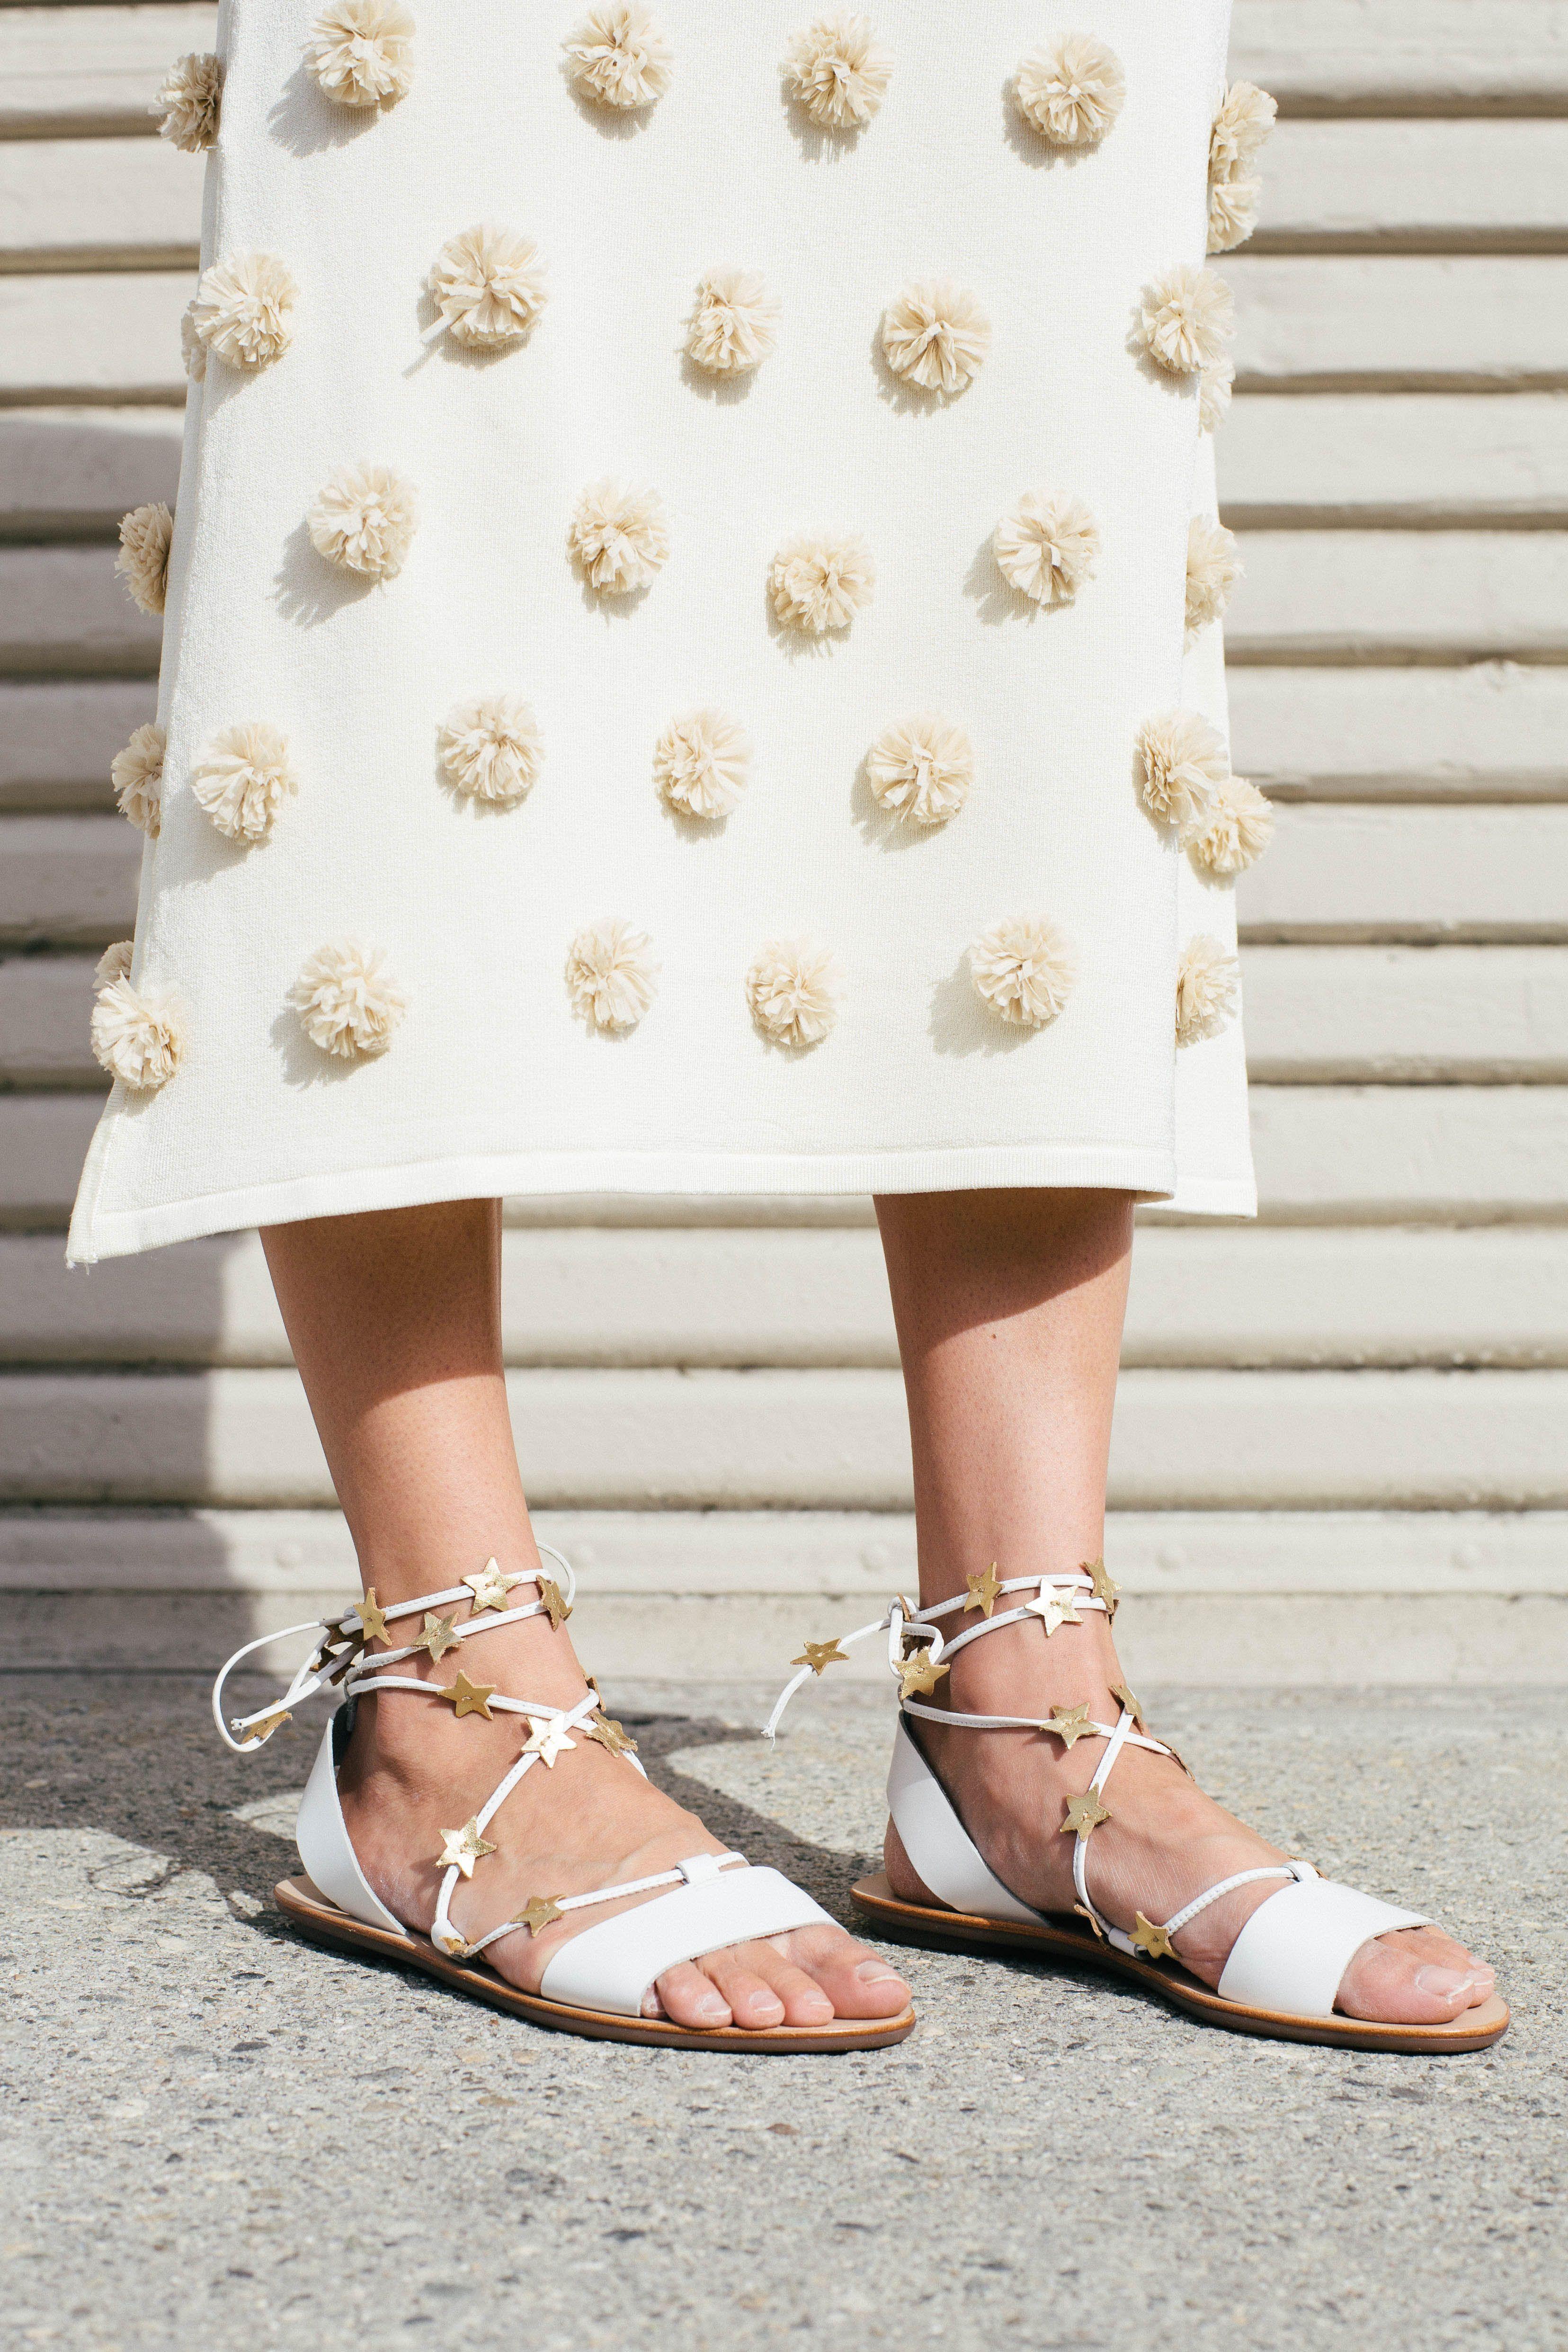 fd6a14fc0e3c Pom Poms   Stars ❤ LR x Kate Brien featuring the Starla Ankle Wrap Sandal